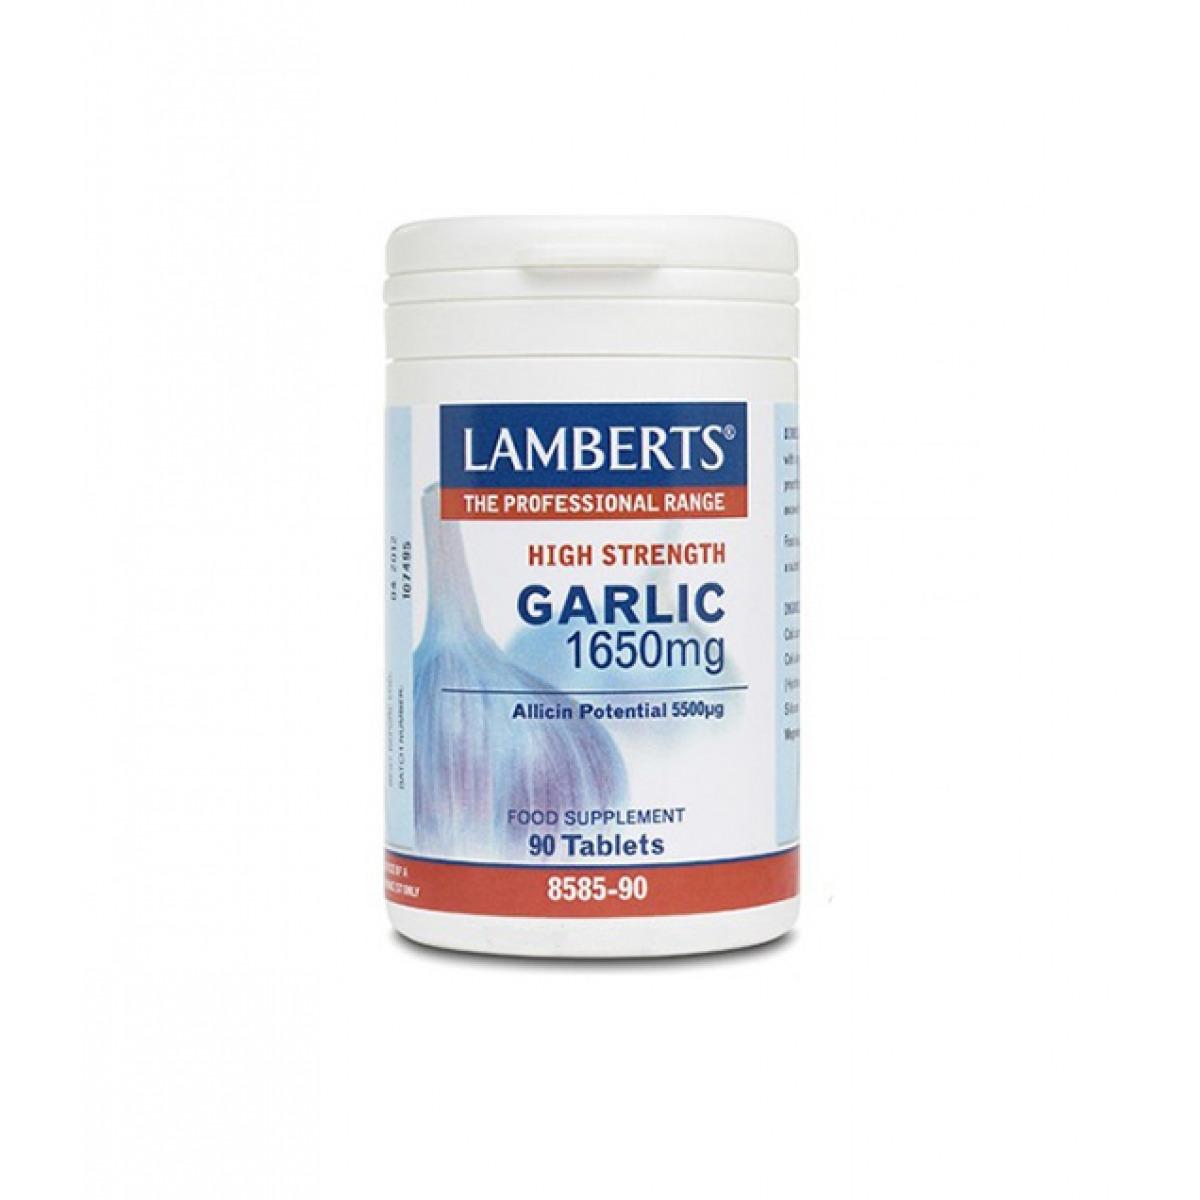 LAMBERTS GARLIC 1650 MG AJO 90 TABL